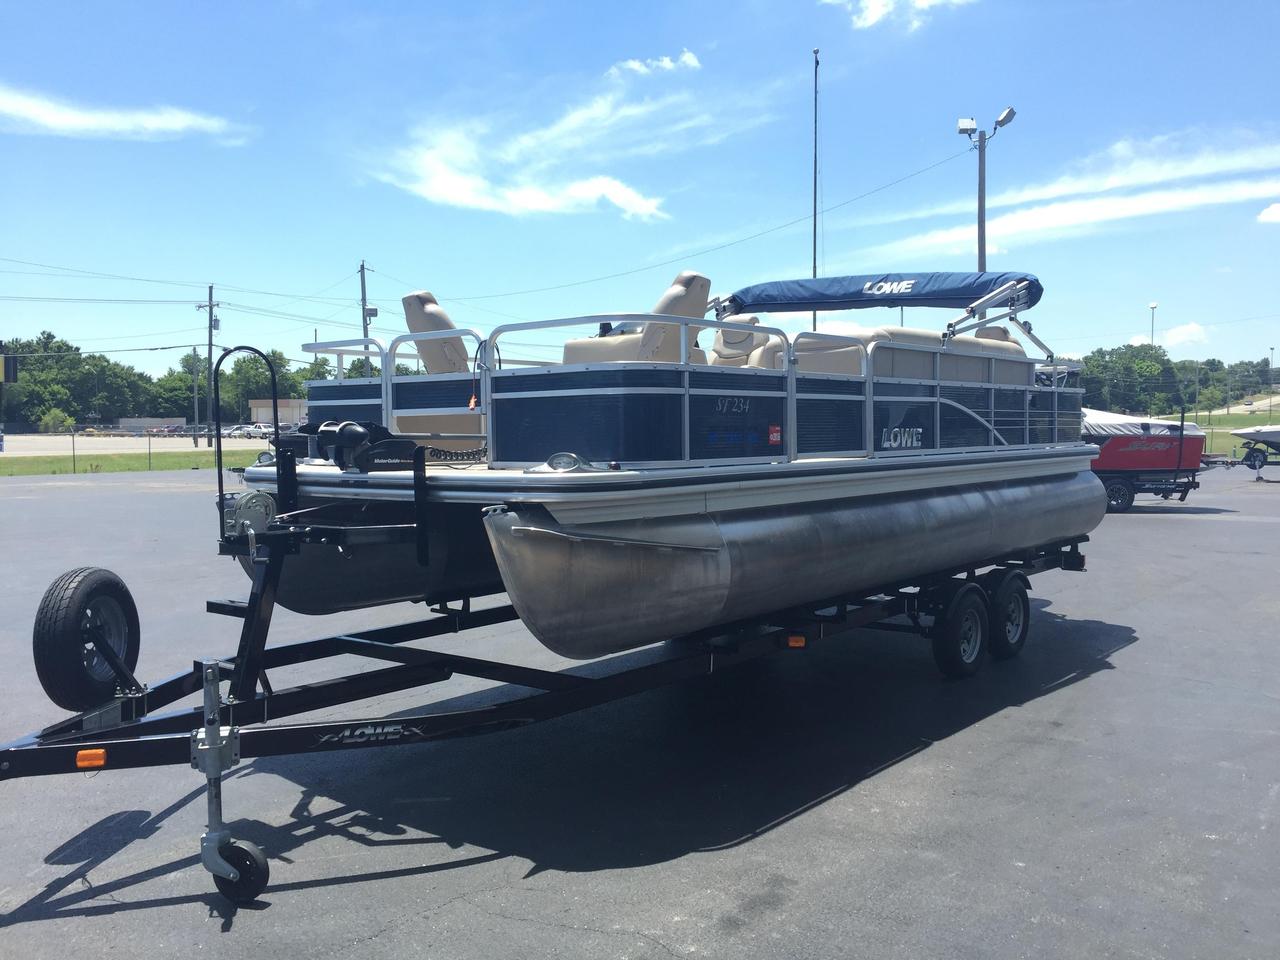 2014 used lowe sf234 sport fish pontoon boat for sale for Used fishing pontoon boats for sale